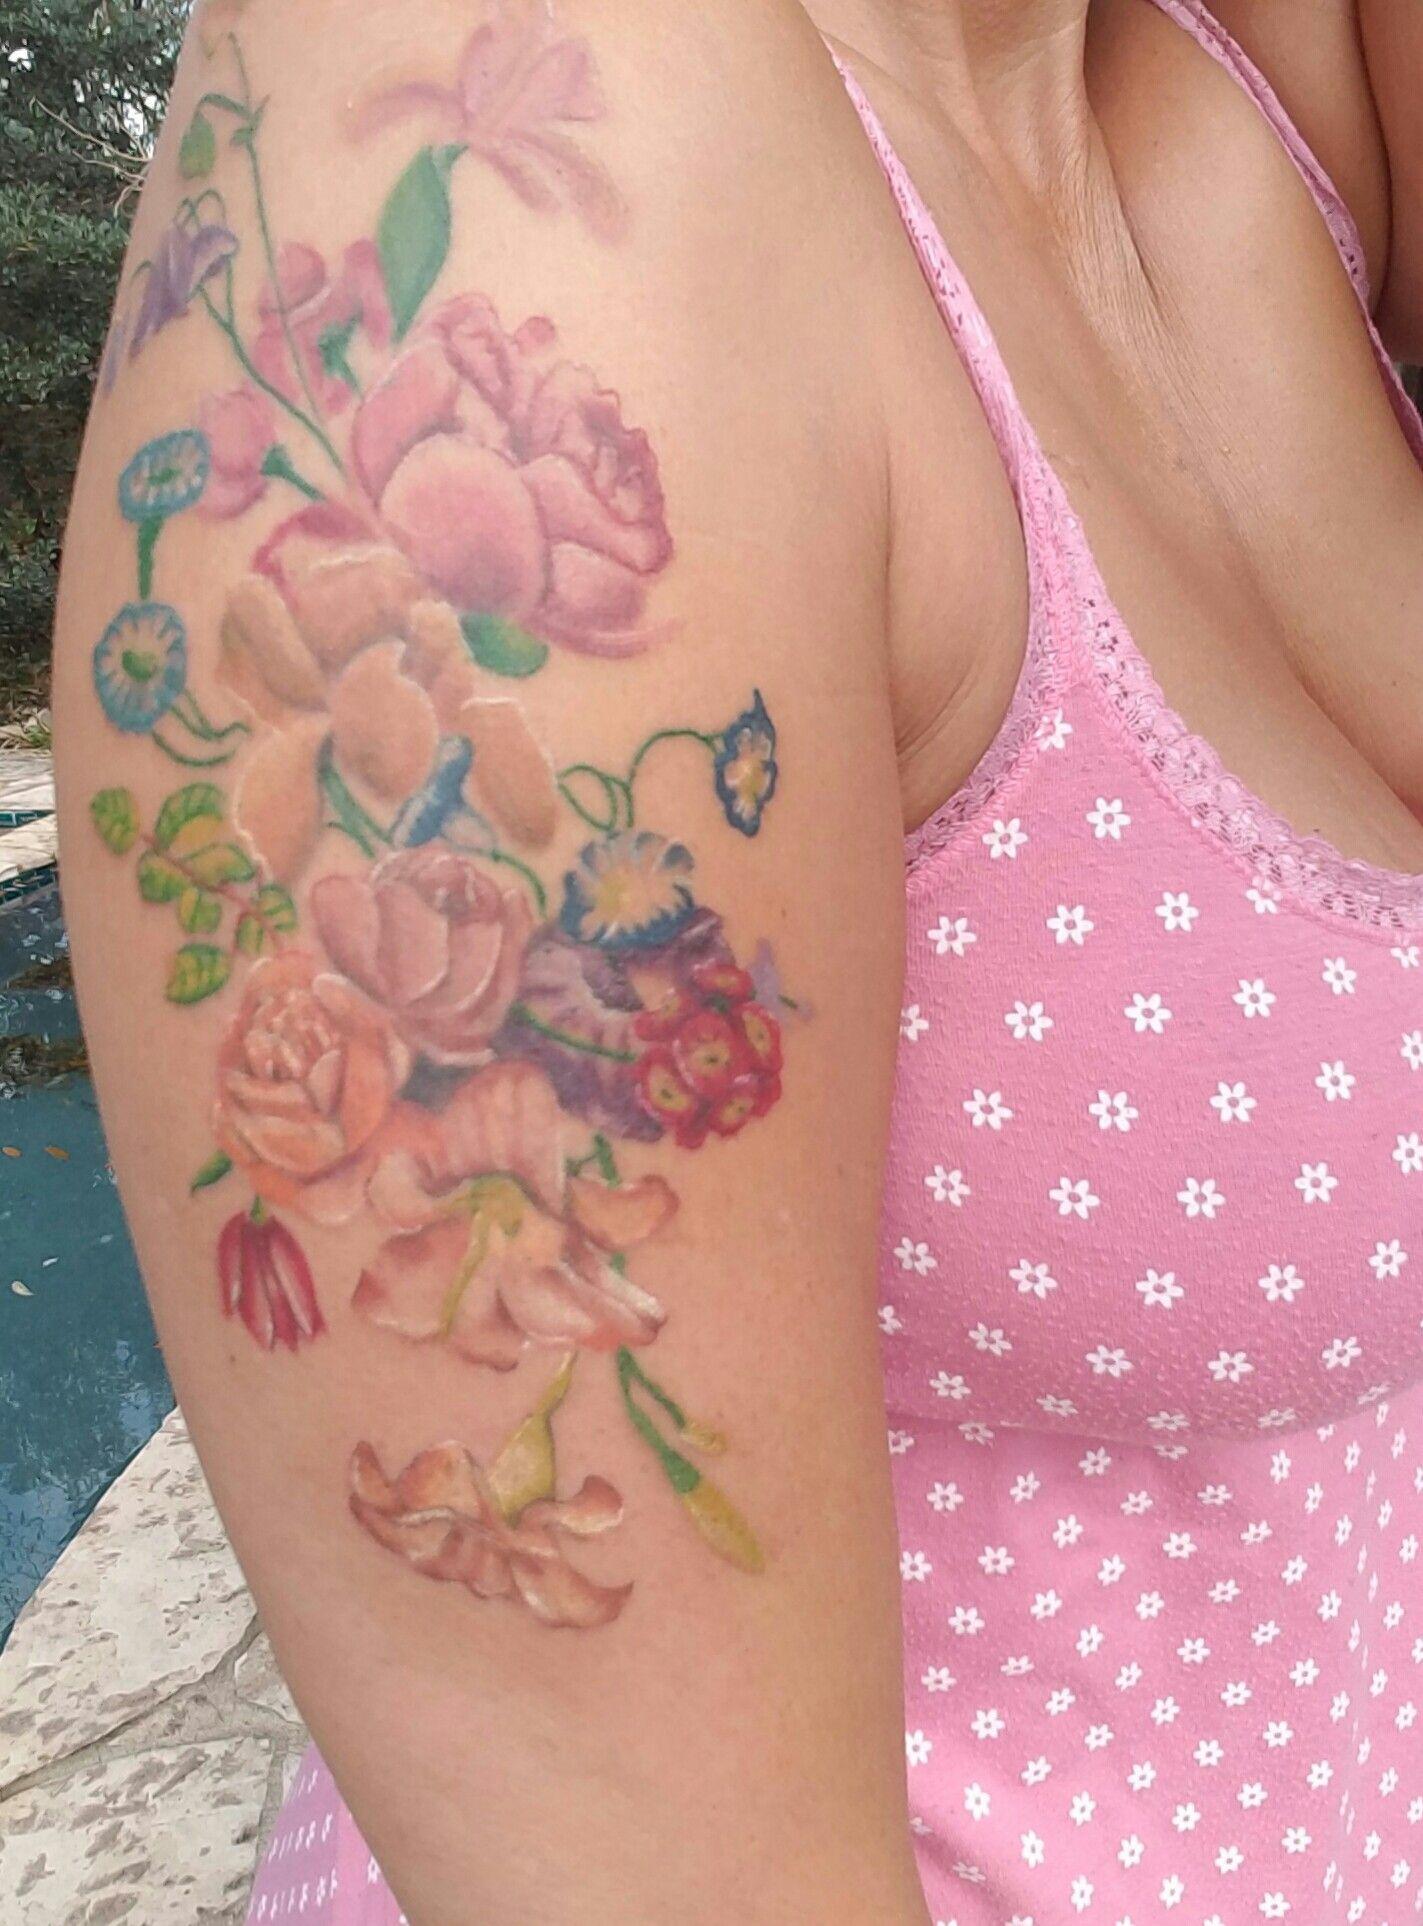 My Beautiful Flower Tattoo Artist Yoma At Twisted Tattoo In San